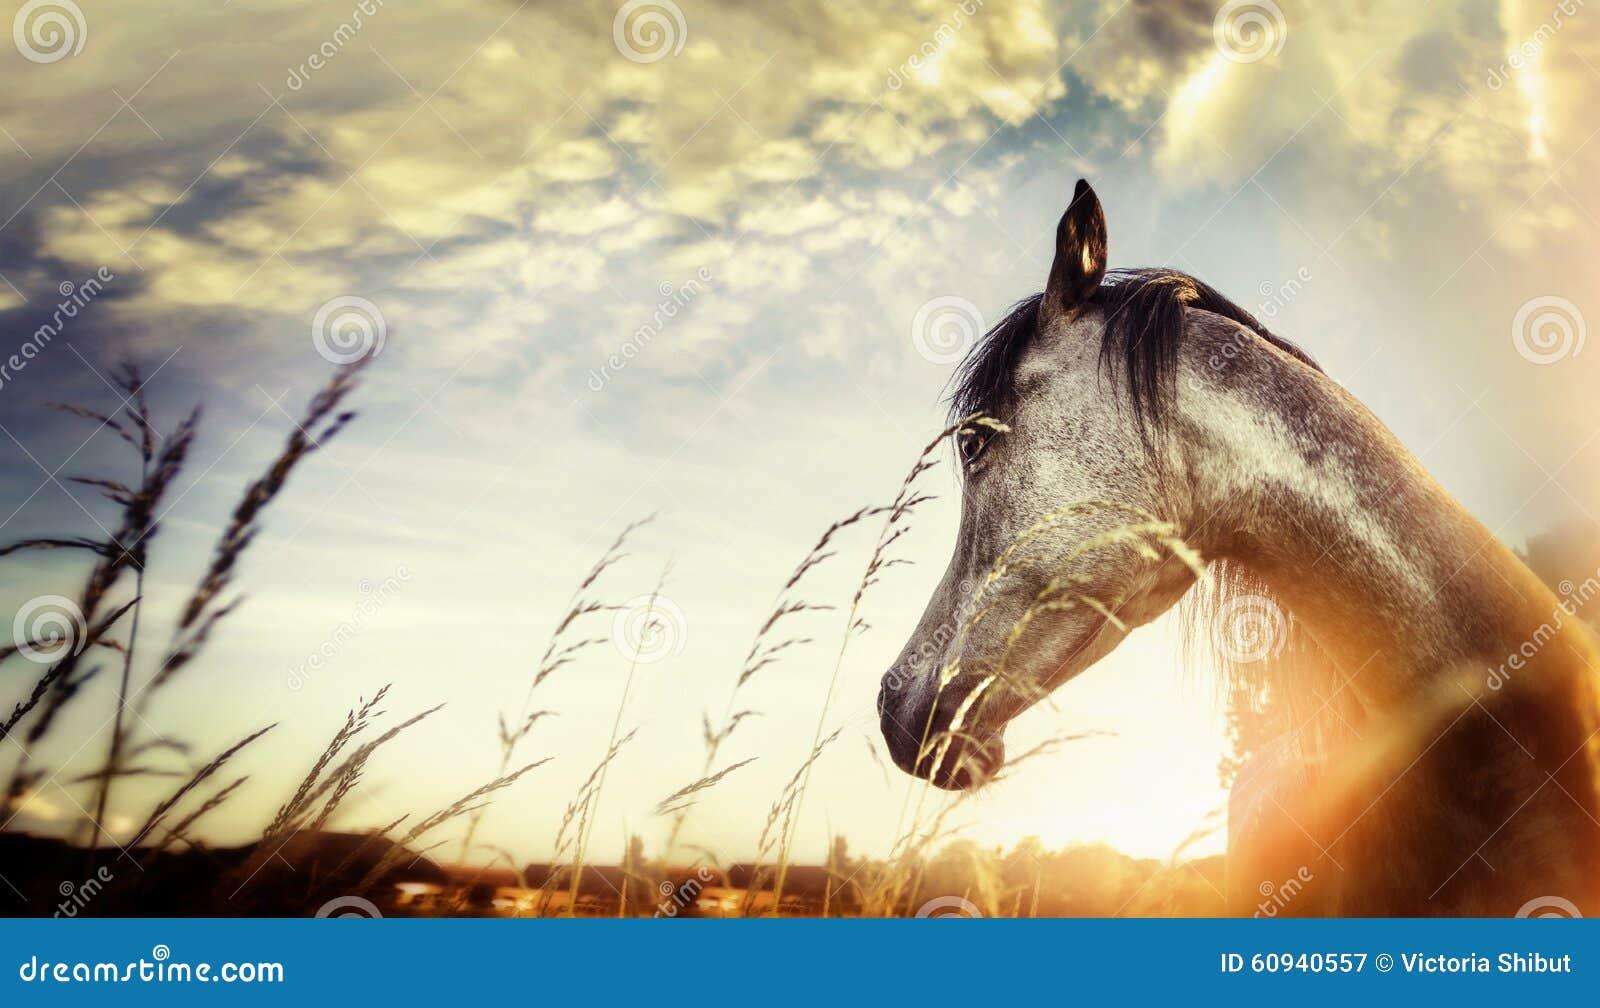 Закройте вверх портрета лошади над предпосылкой сумрака природы захода солнца